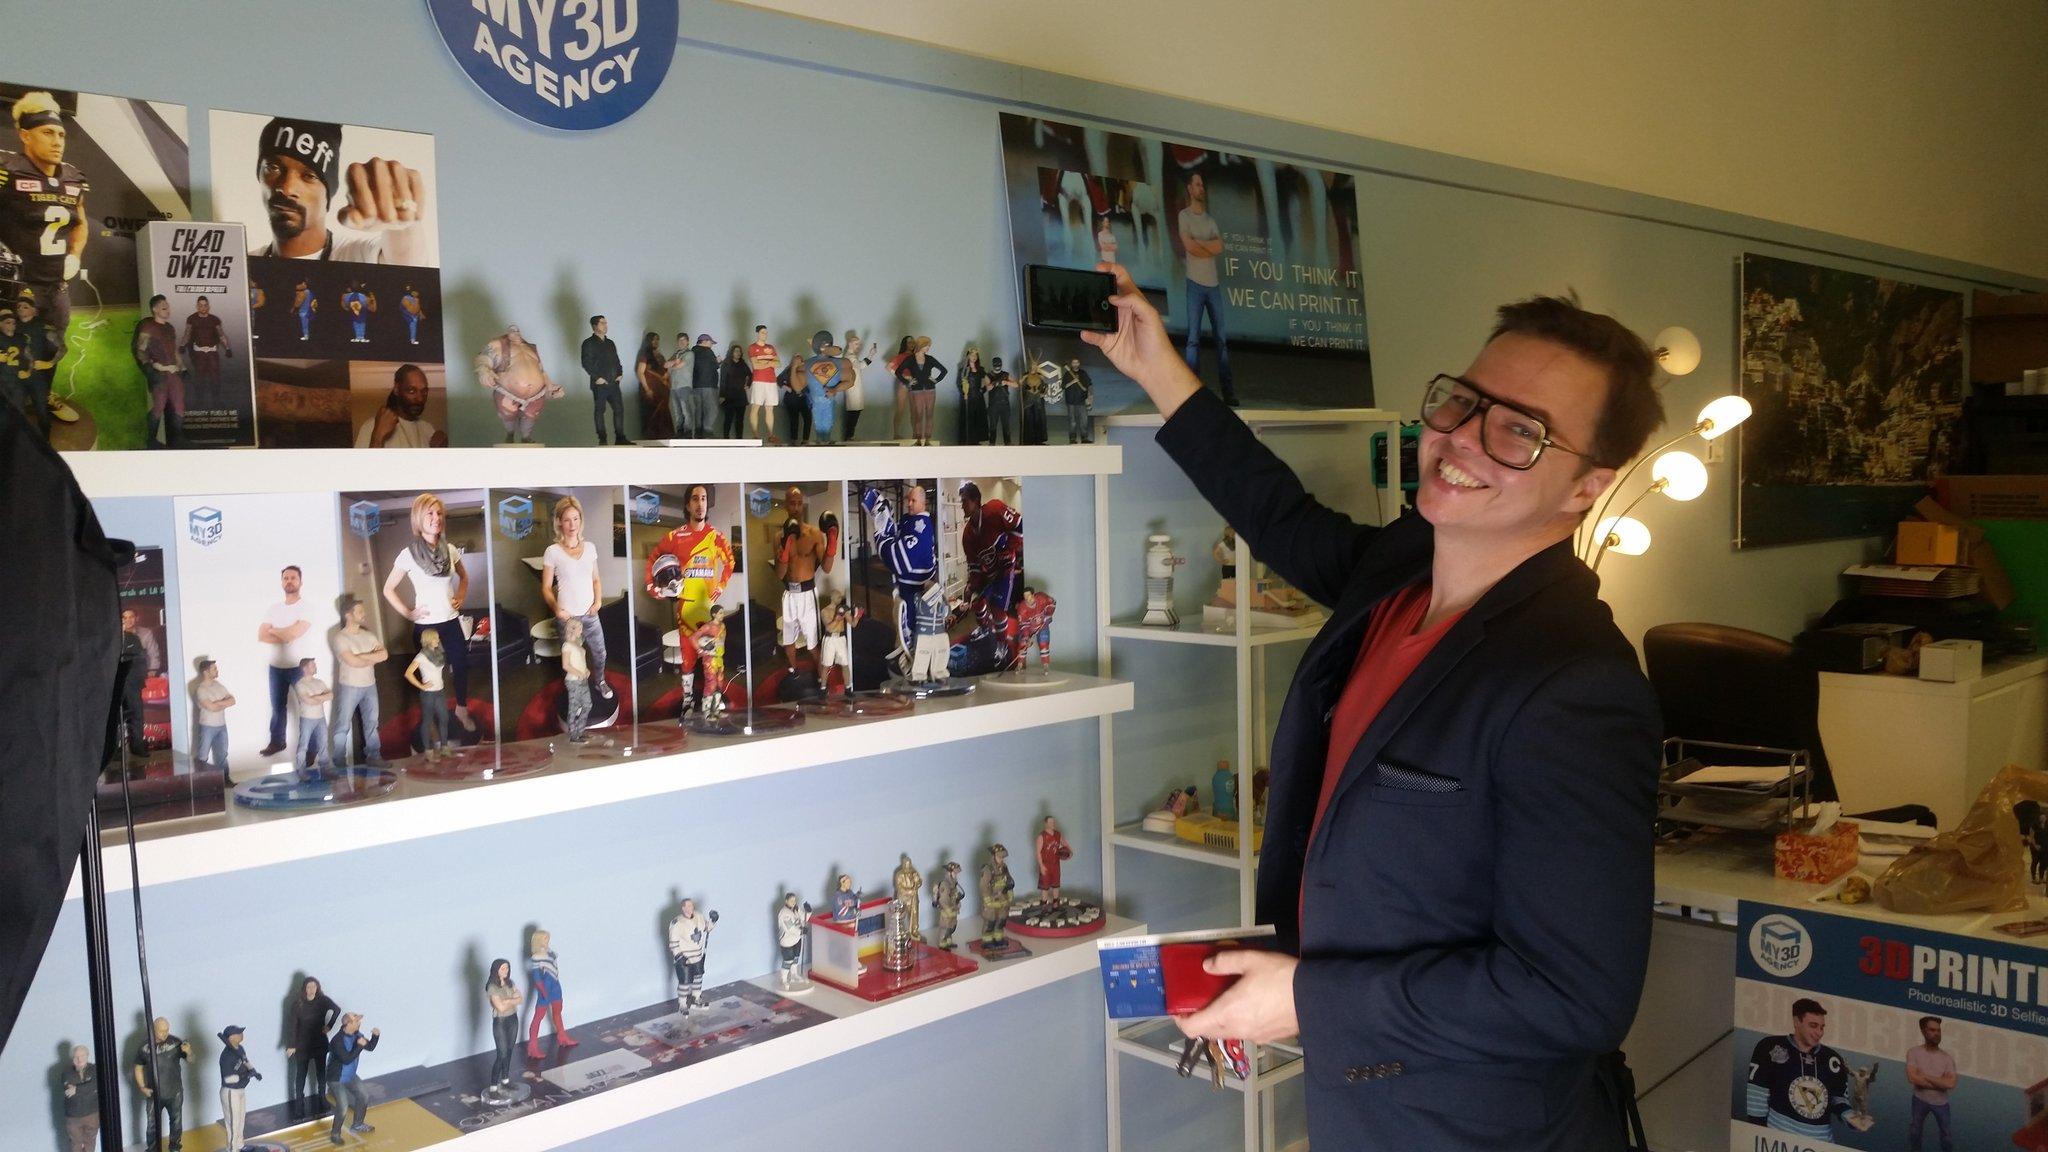 Sean Ward Show at My3D Agency in Toronto